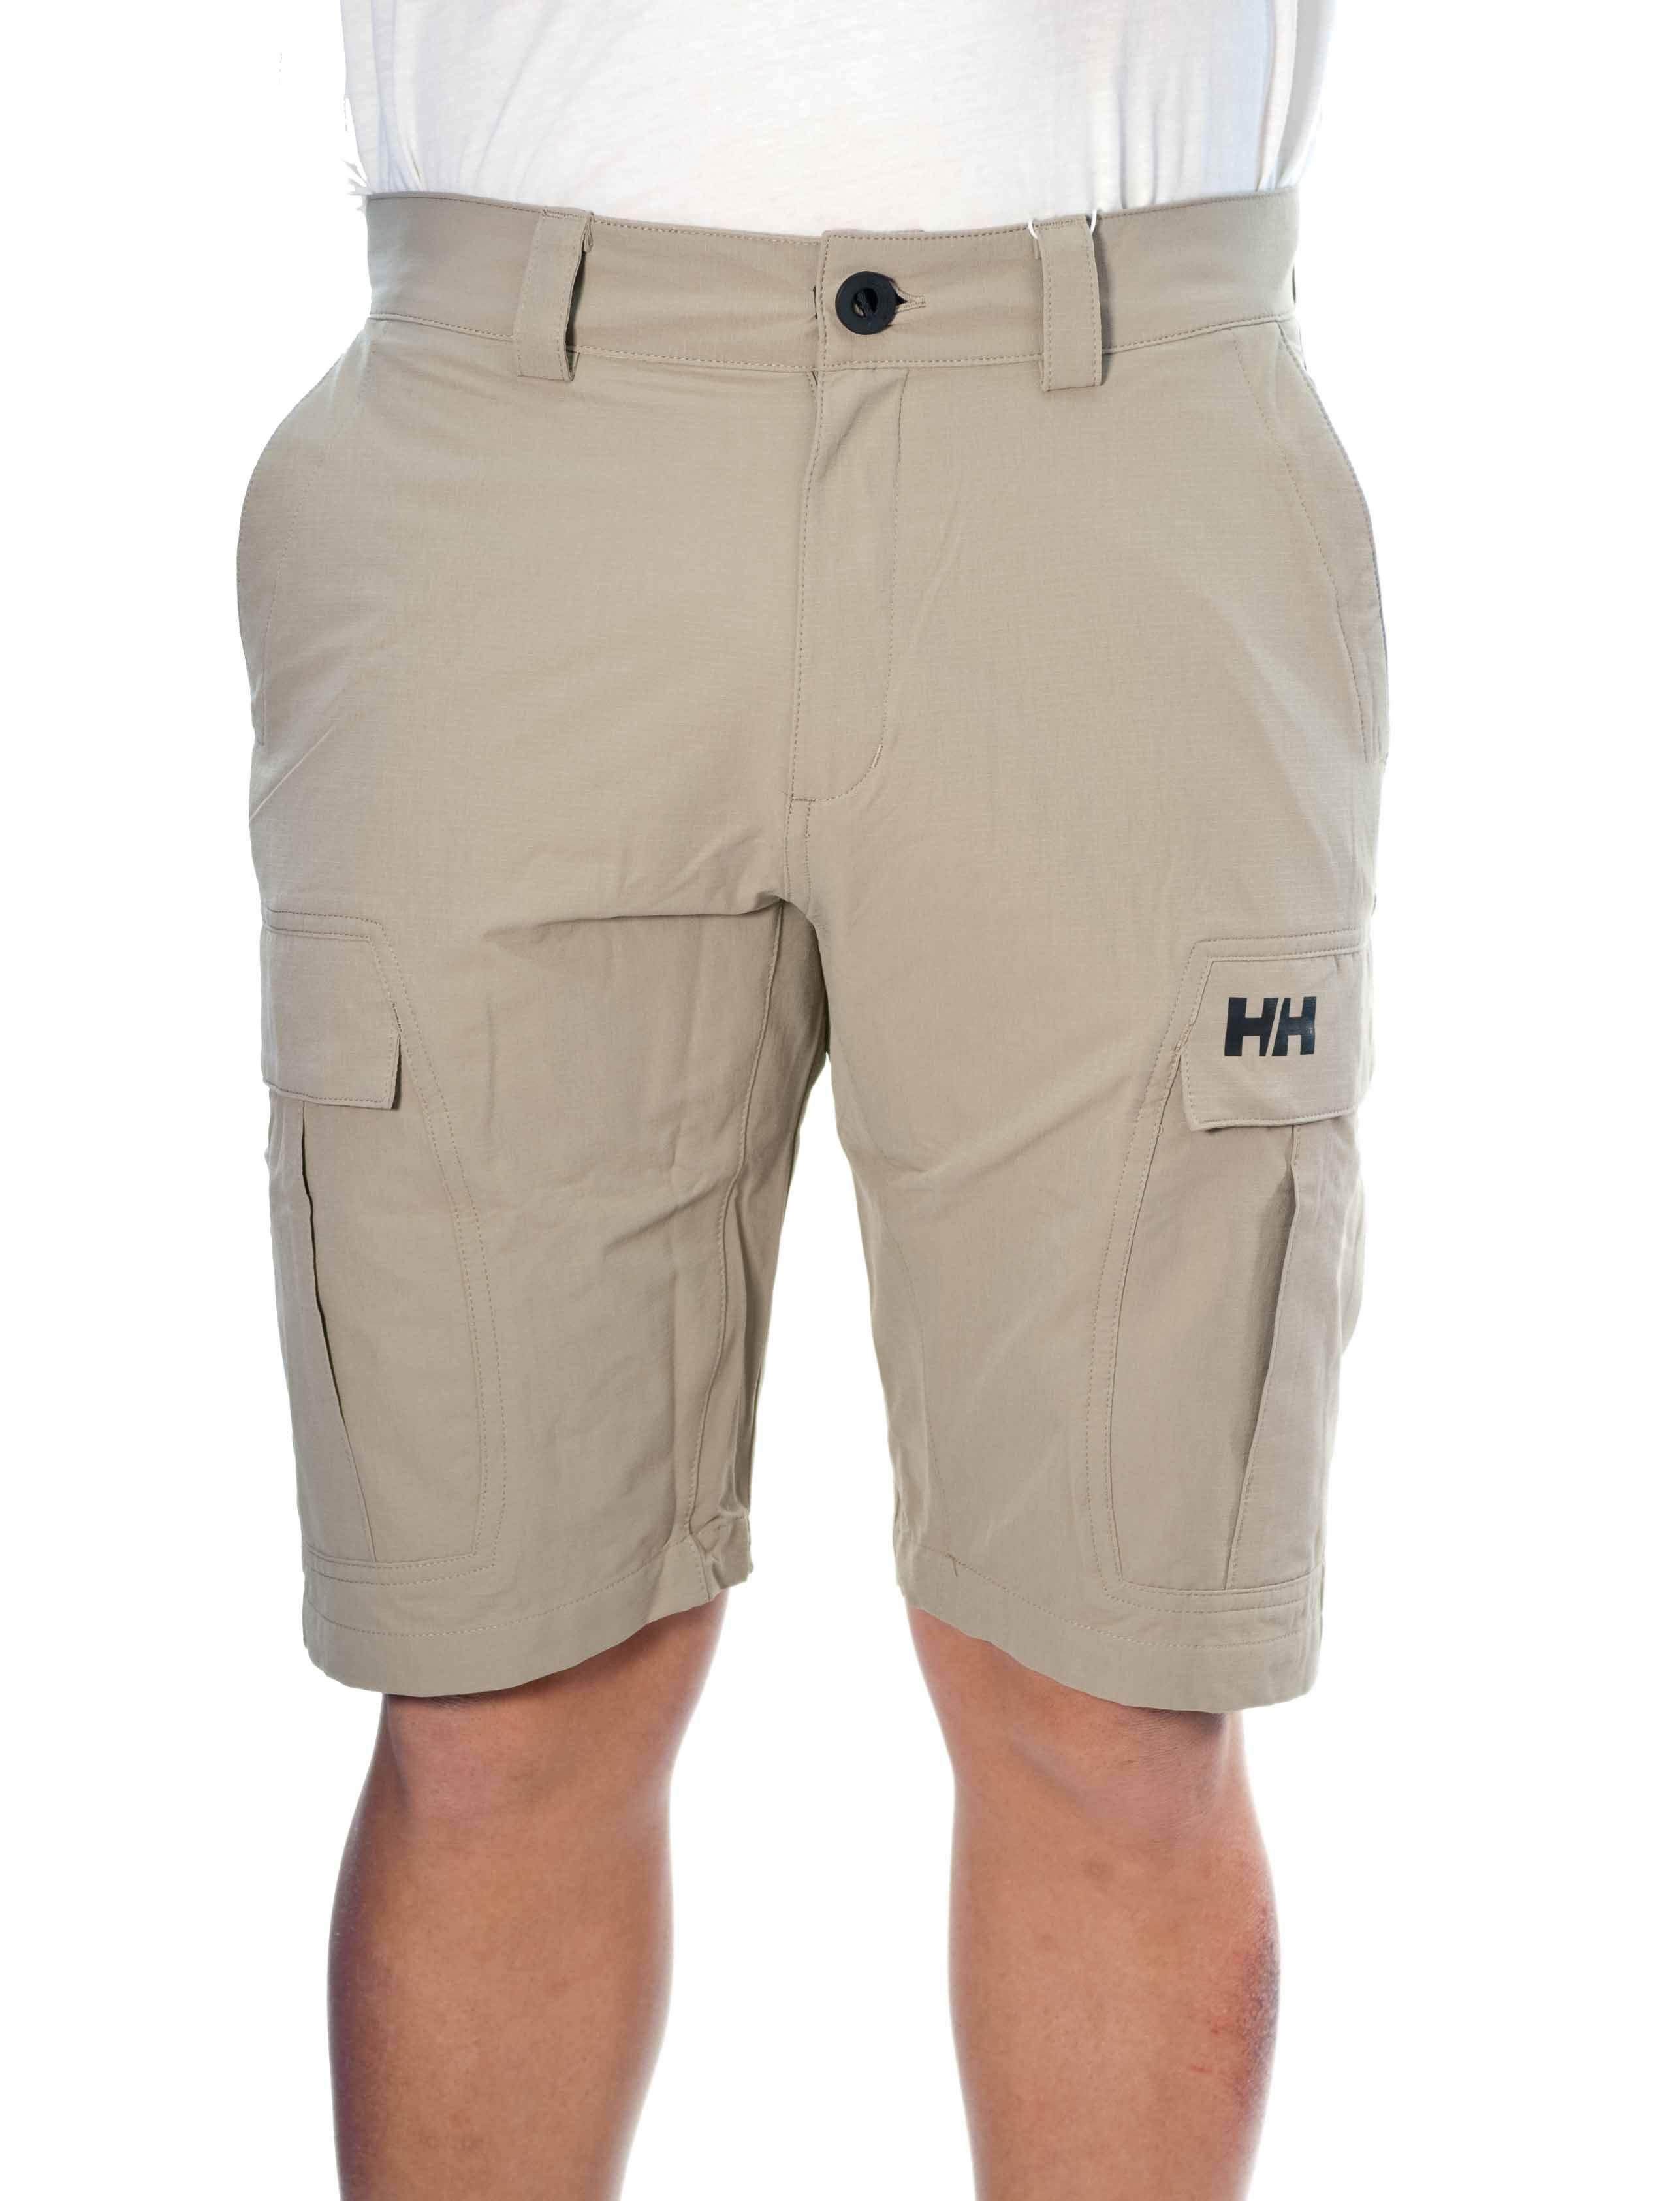 Immagine di QD Cargo Shorts 11 FALLEN ROCK